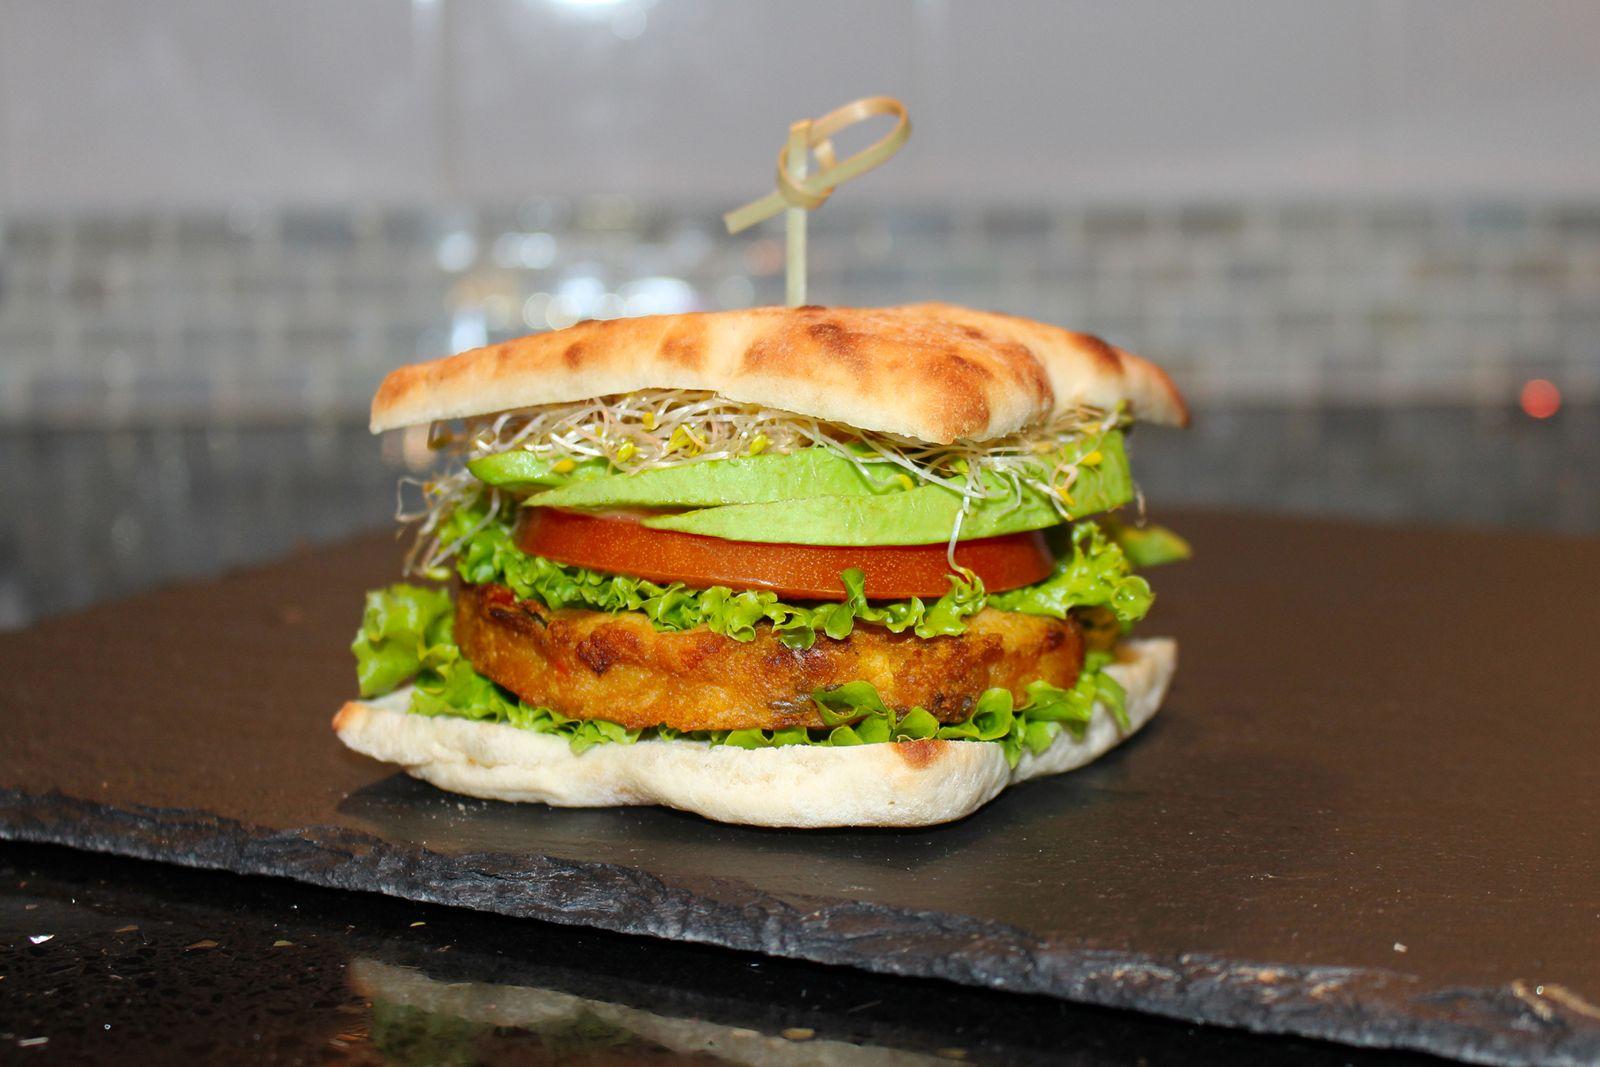 Sandella's Flatbread Cafe Avocado Veggie Burger